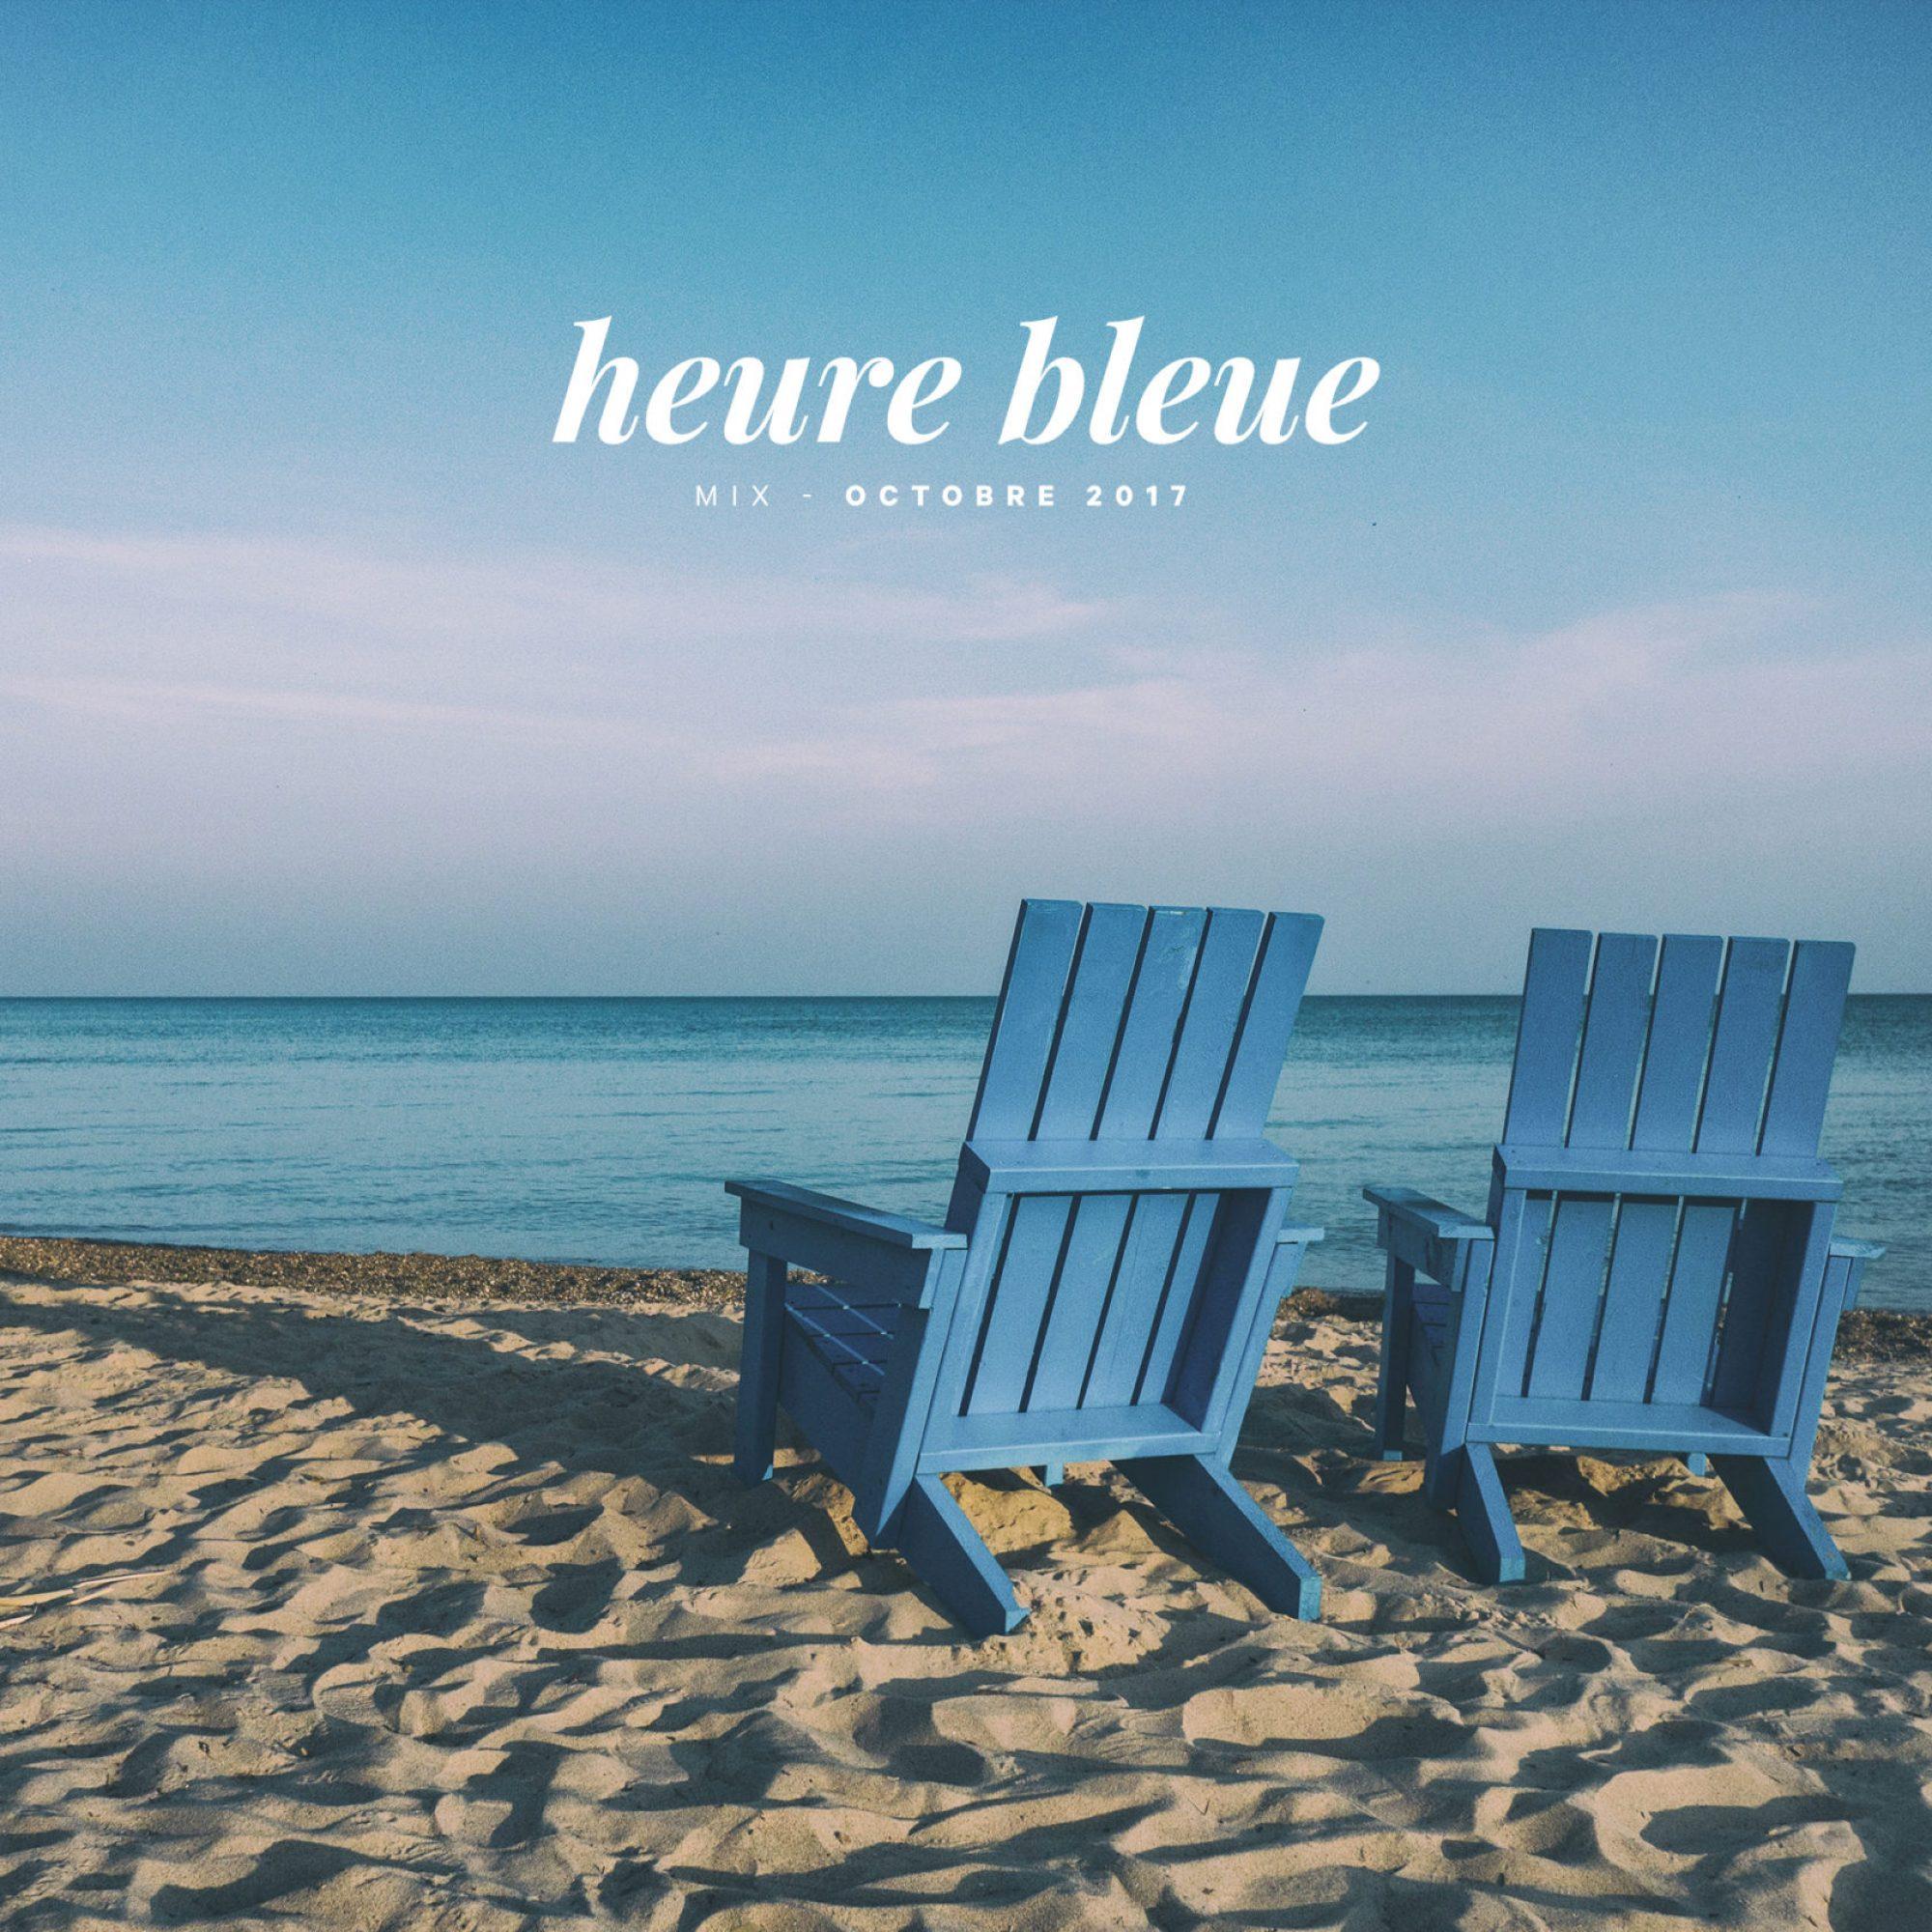 mixtape heure bleue octobre